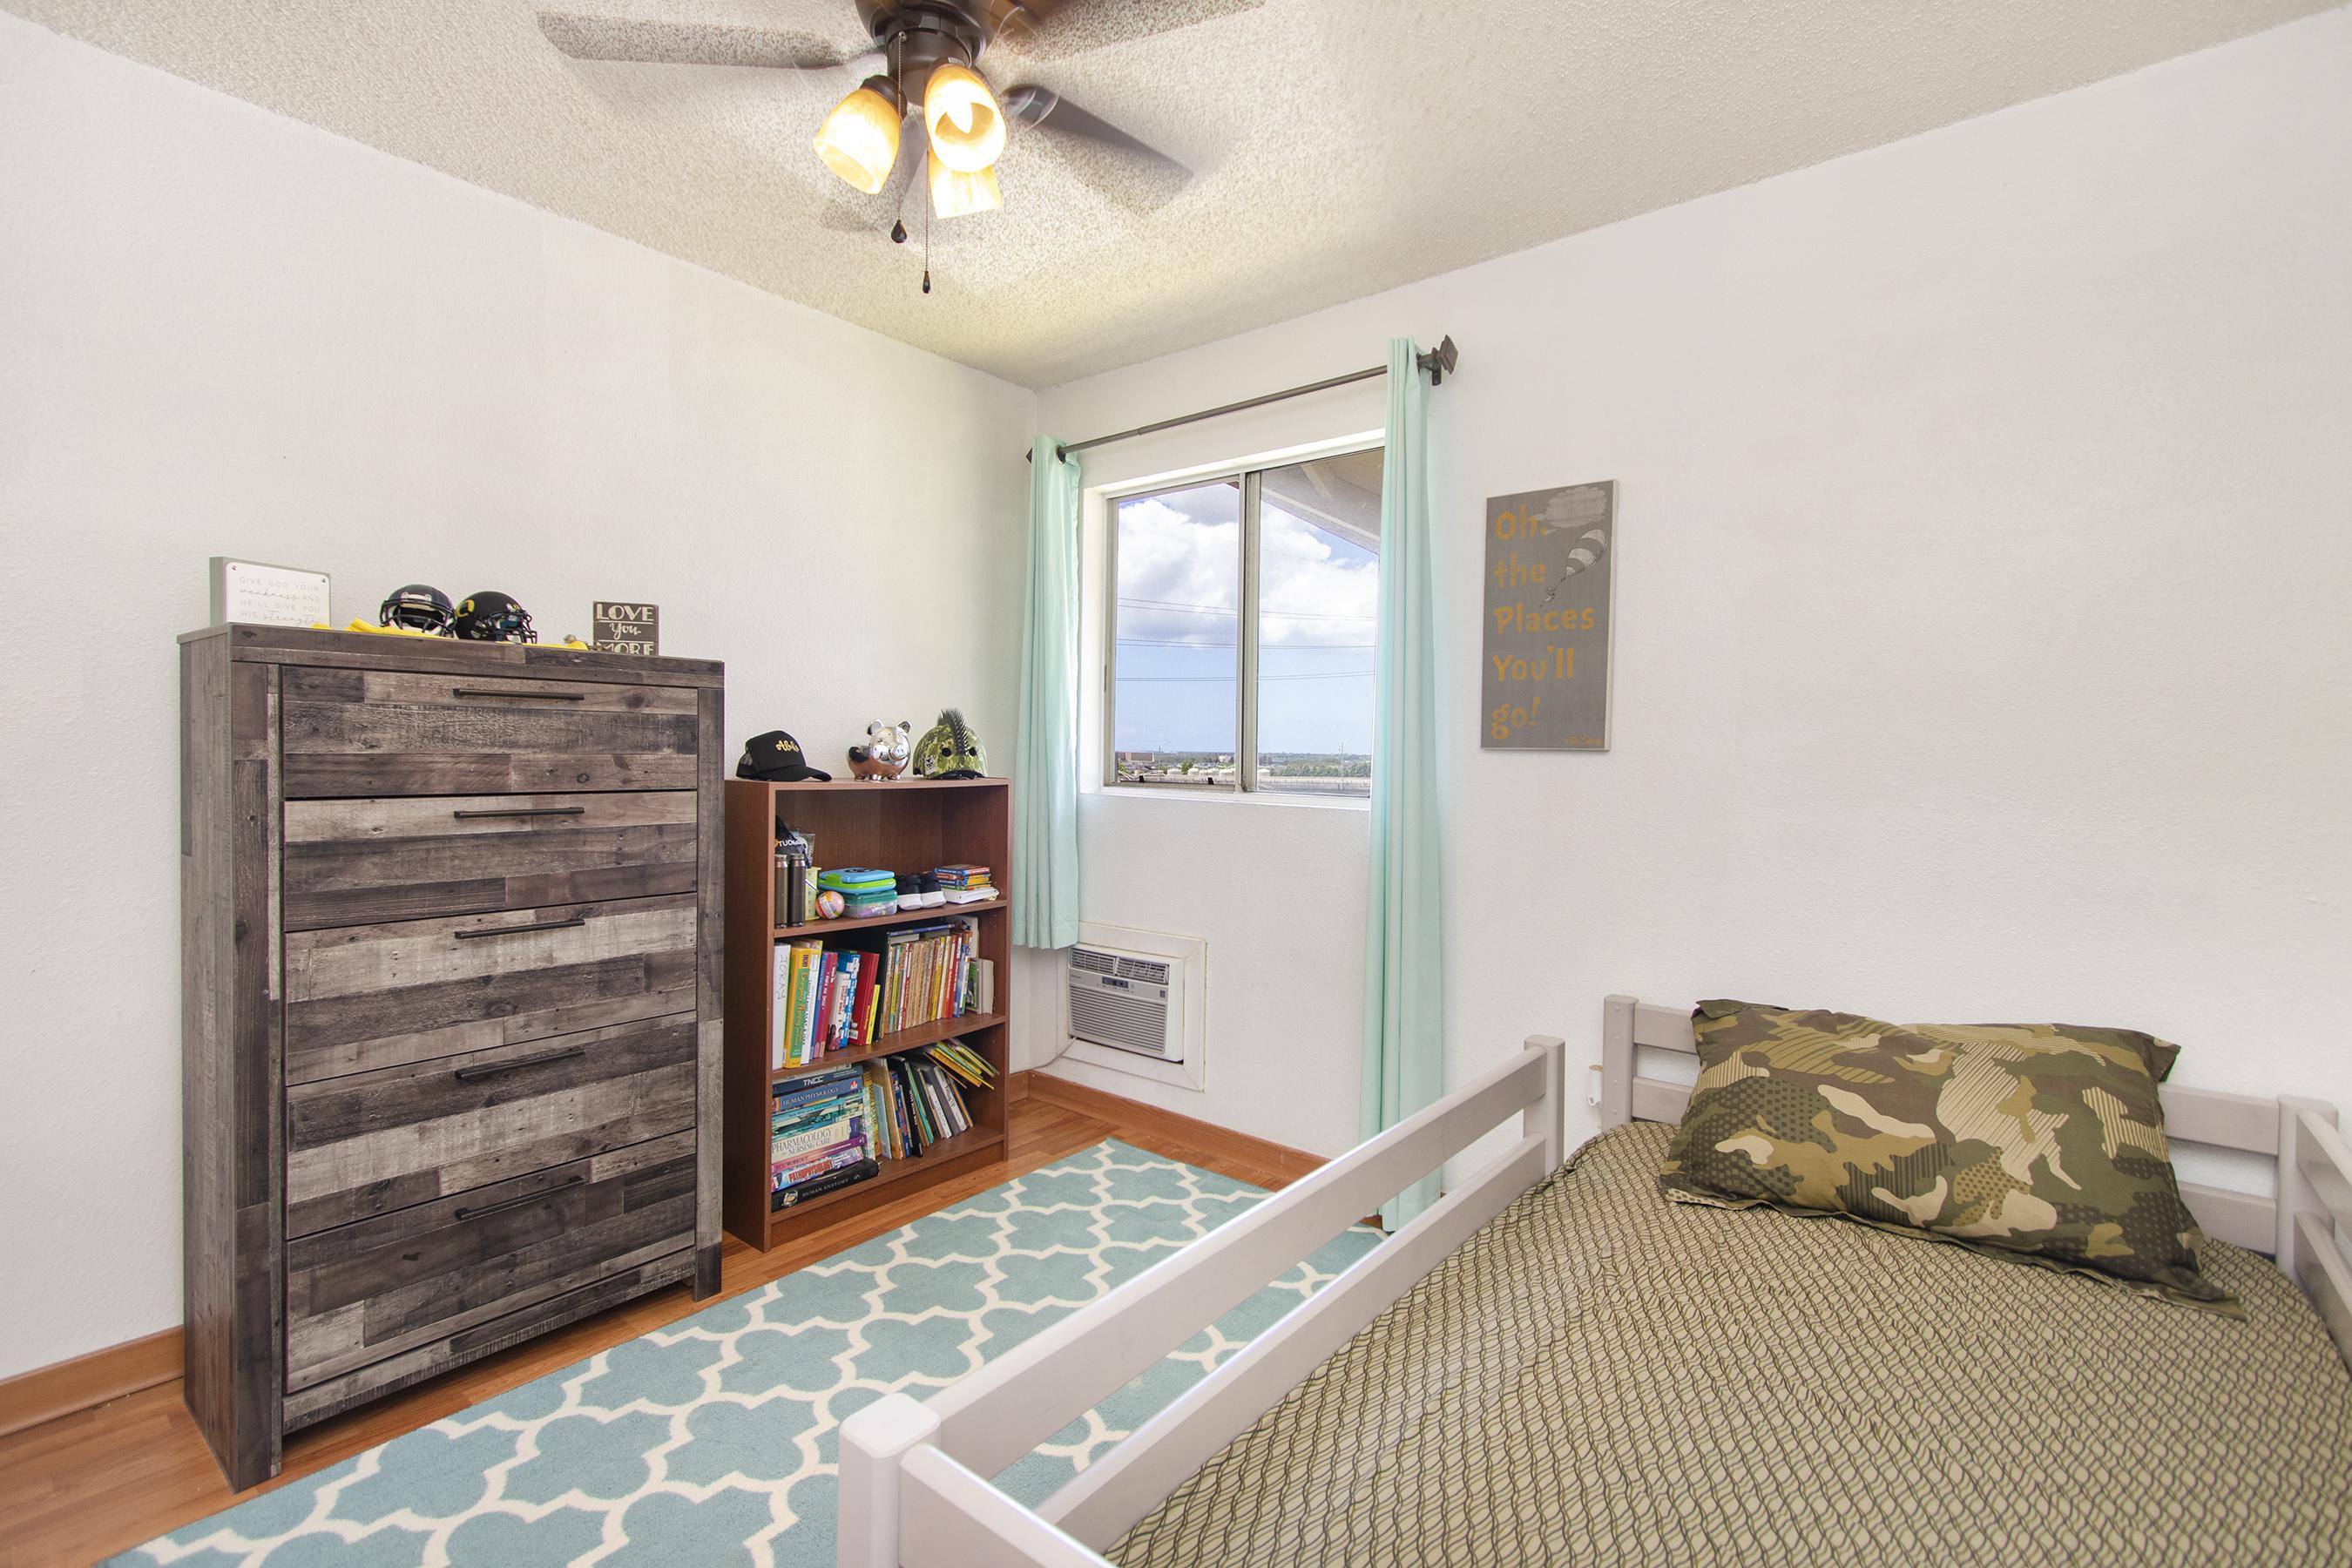 Second bedroom at 94-517 Lumiaina Street Unit K205